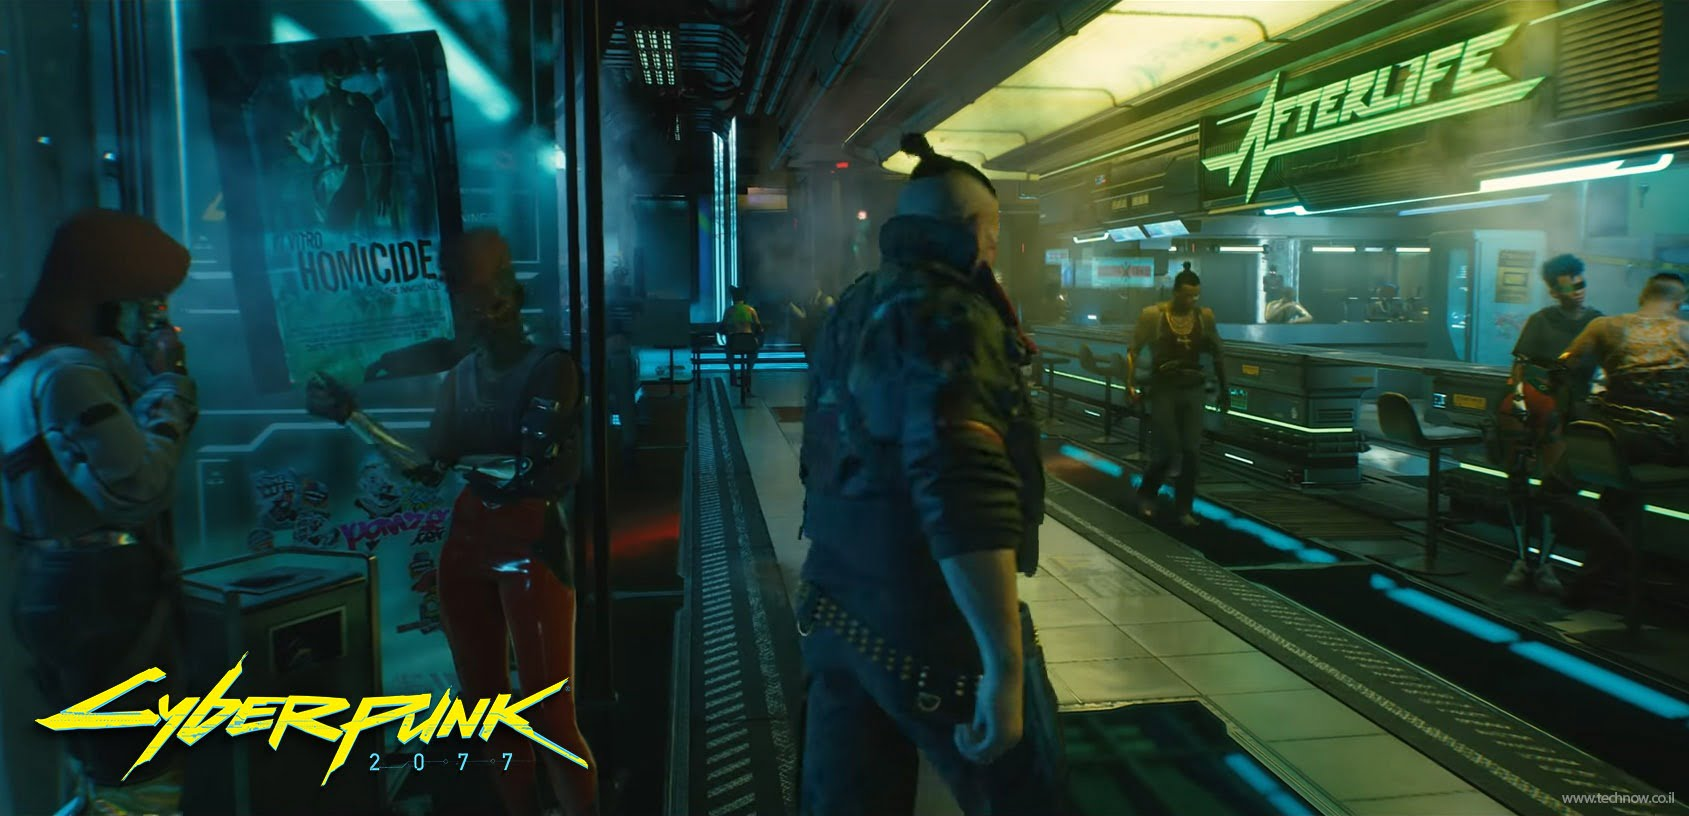 CyberPunk 2077 בקרוב